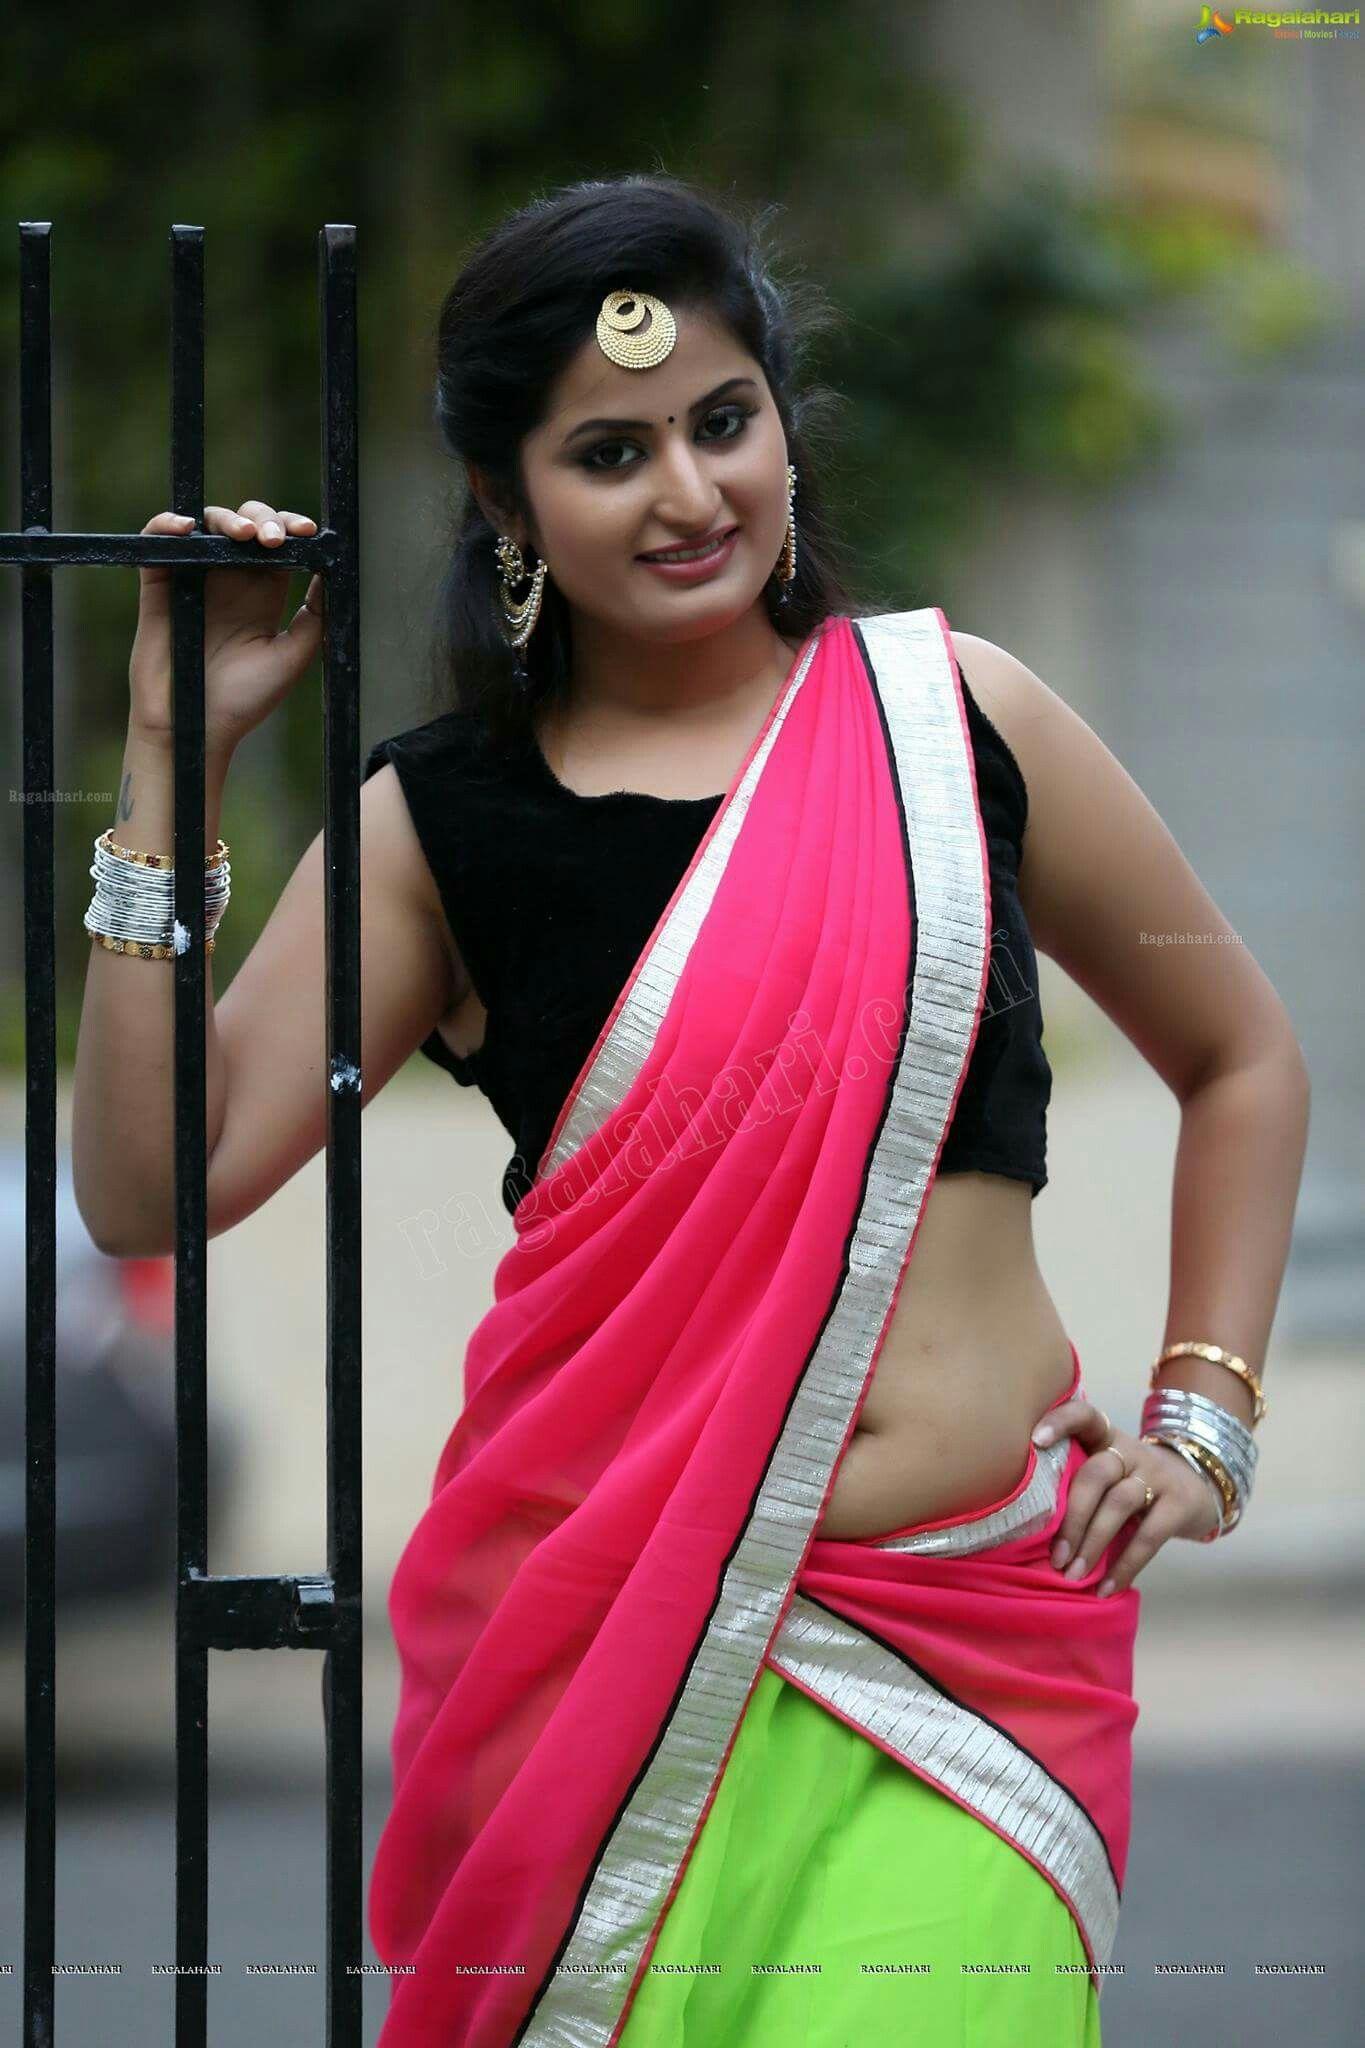 Pin by dn on navel u hip pinterest saree models navel and saree